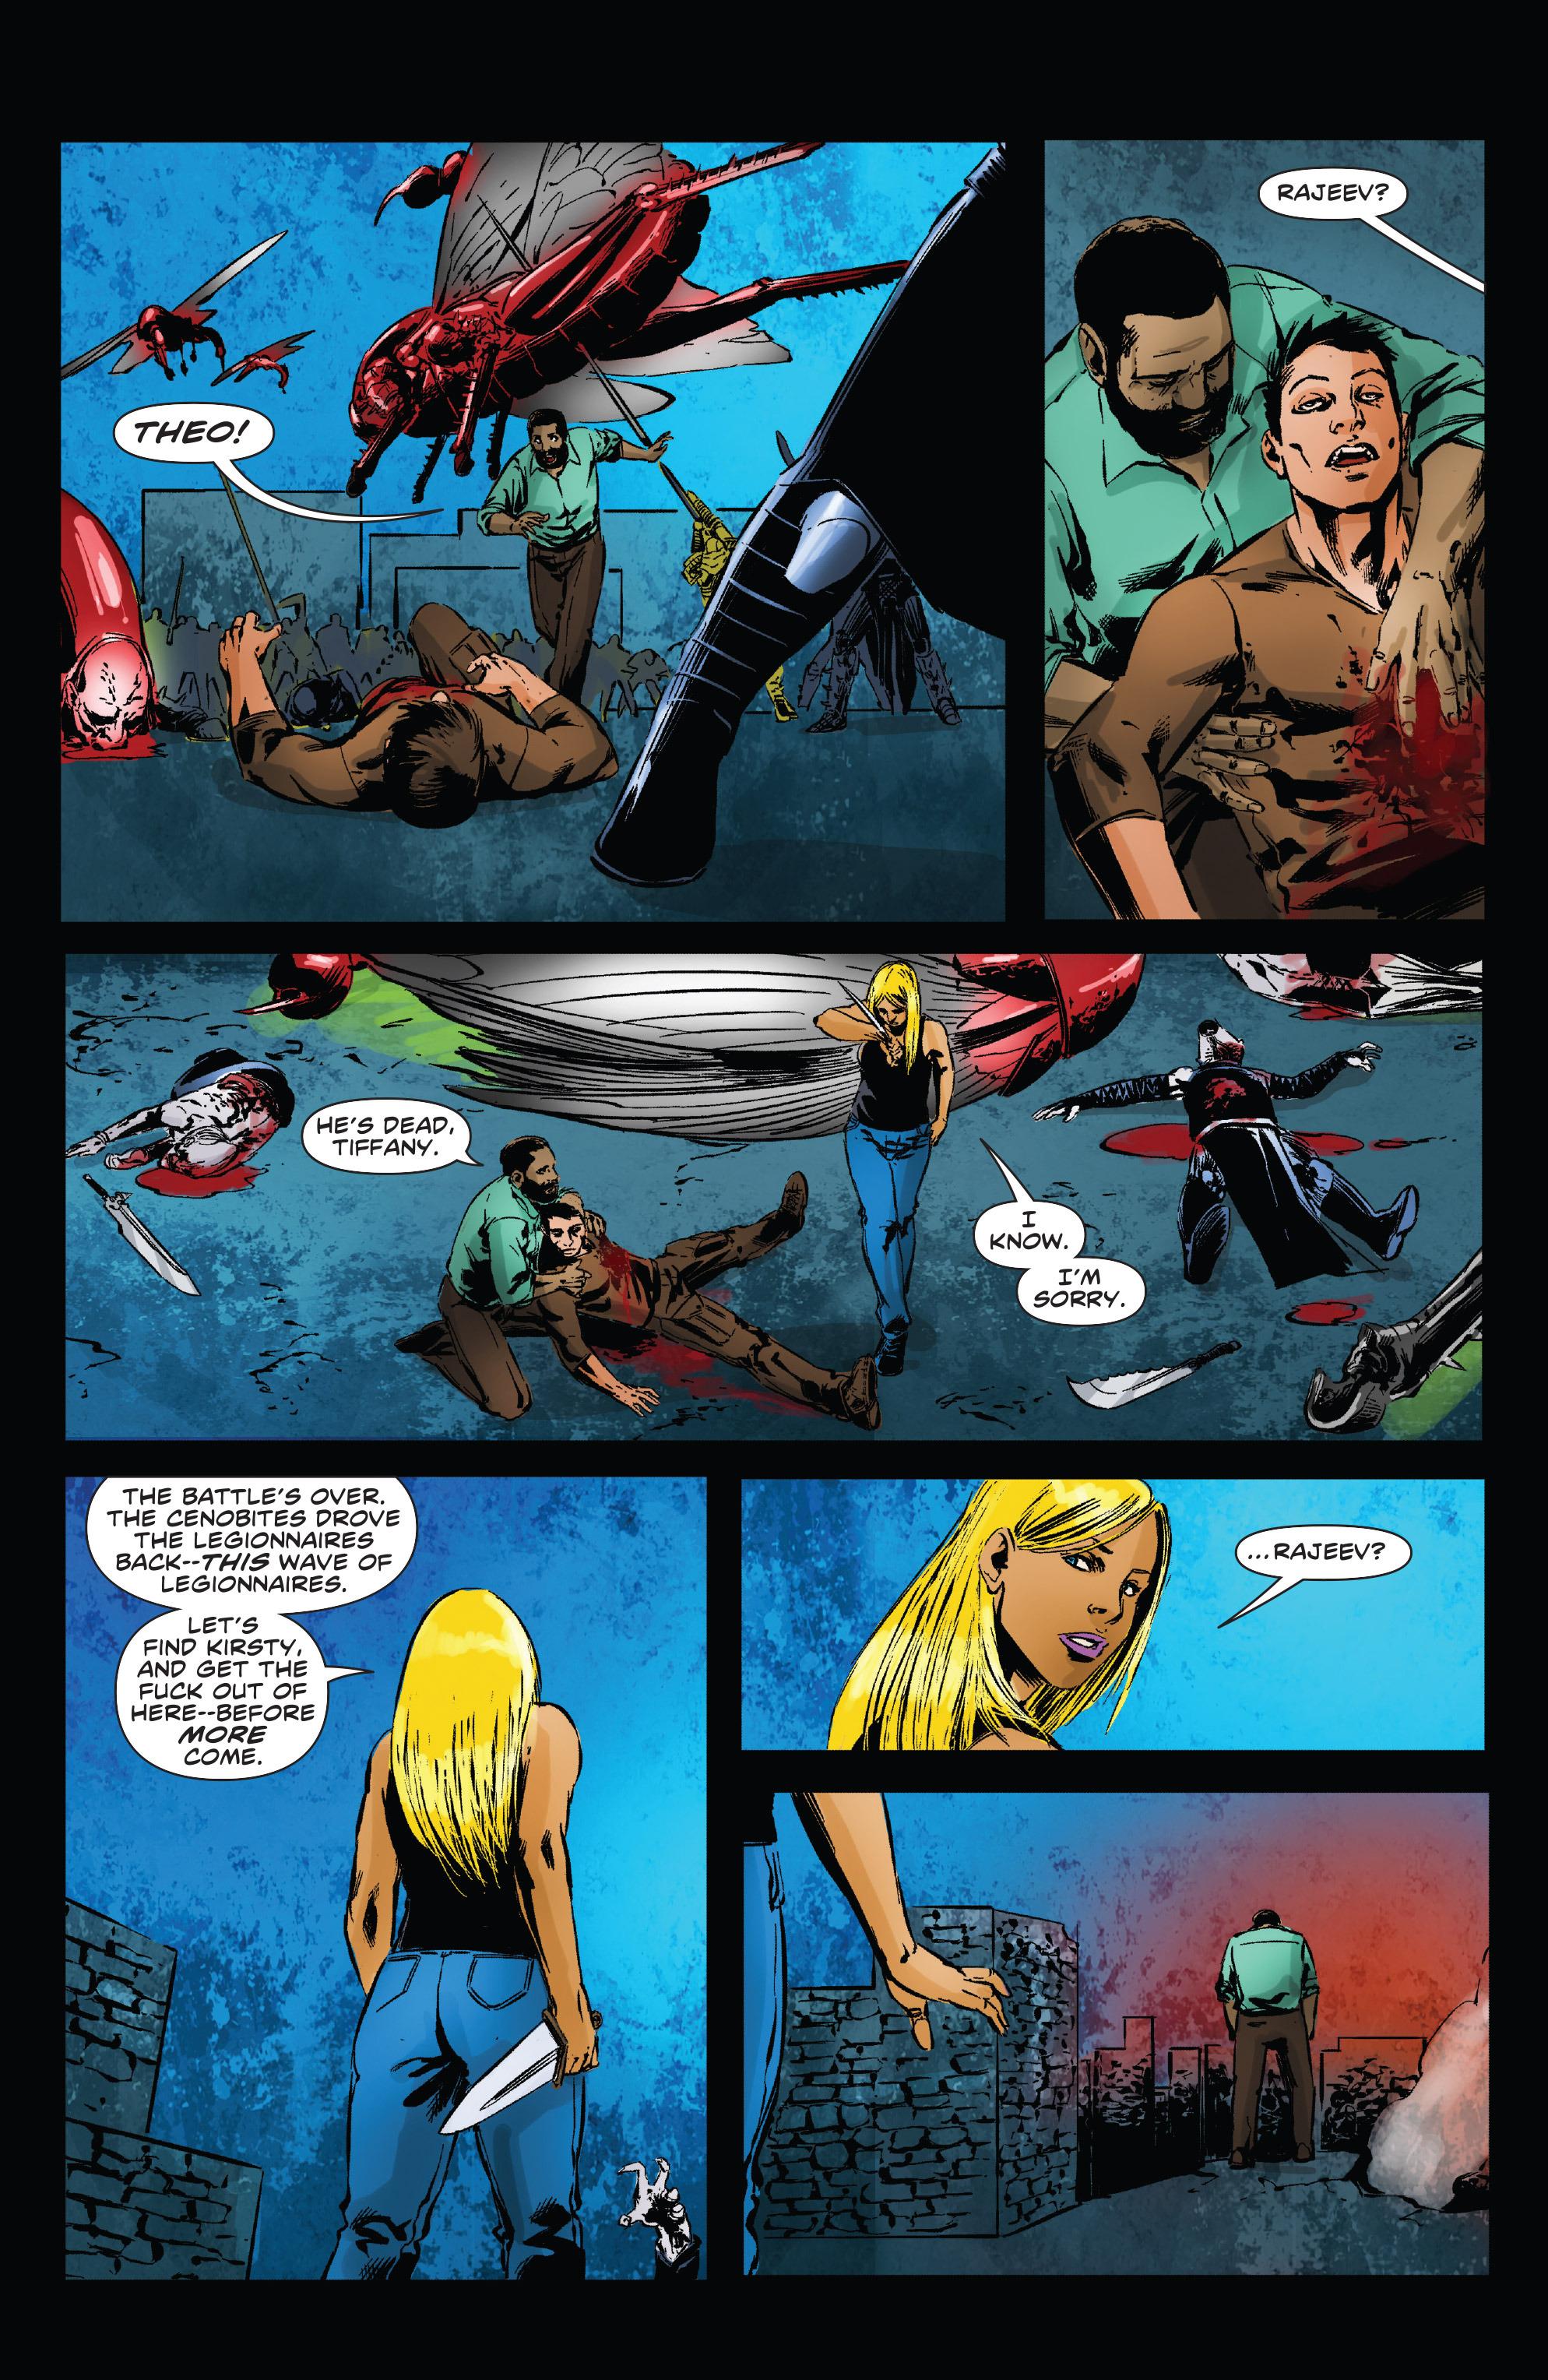 Read online Clive Barker's Hellraiser: The Dark Watch comic -  Issue # TPB 3 - 56